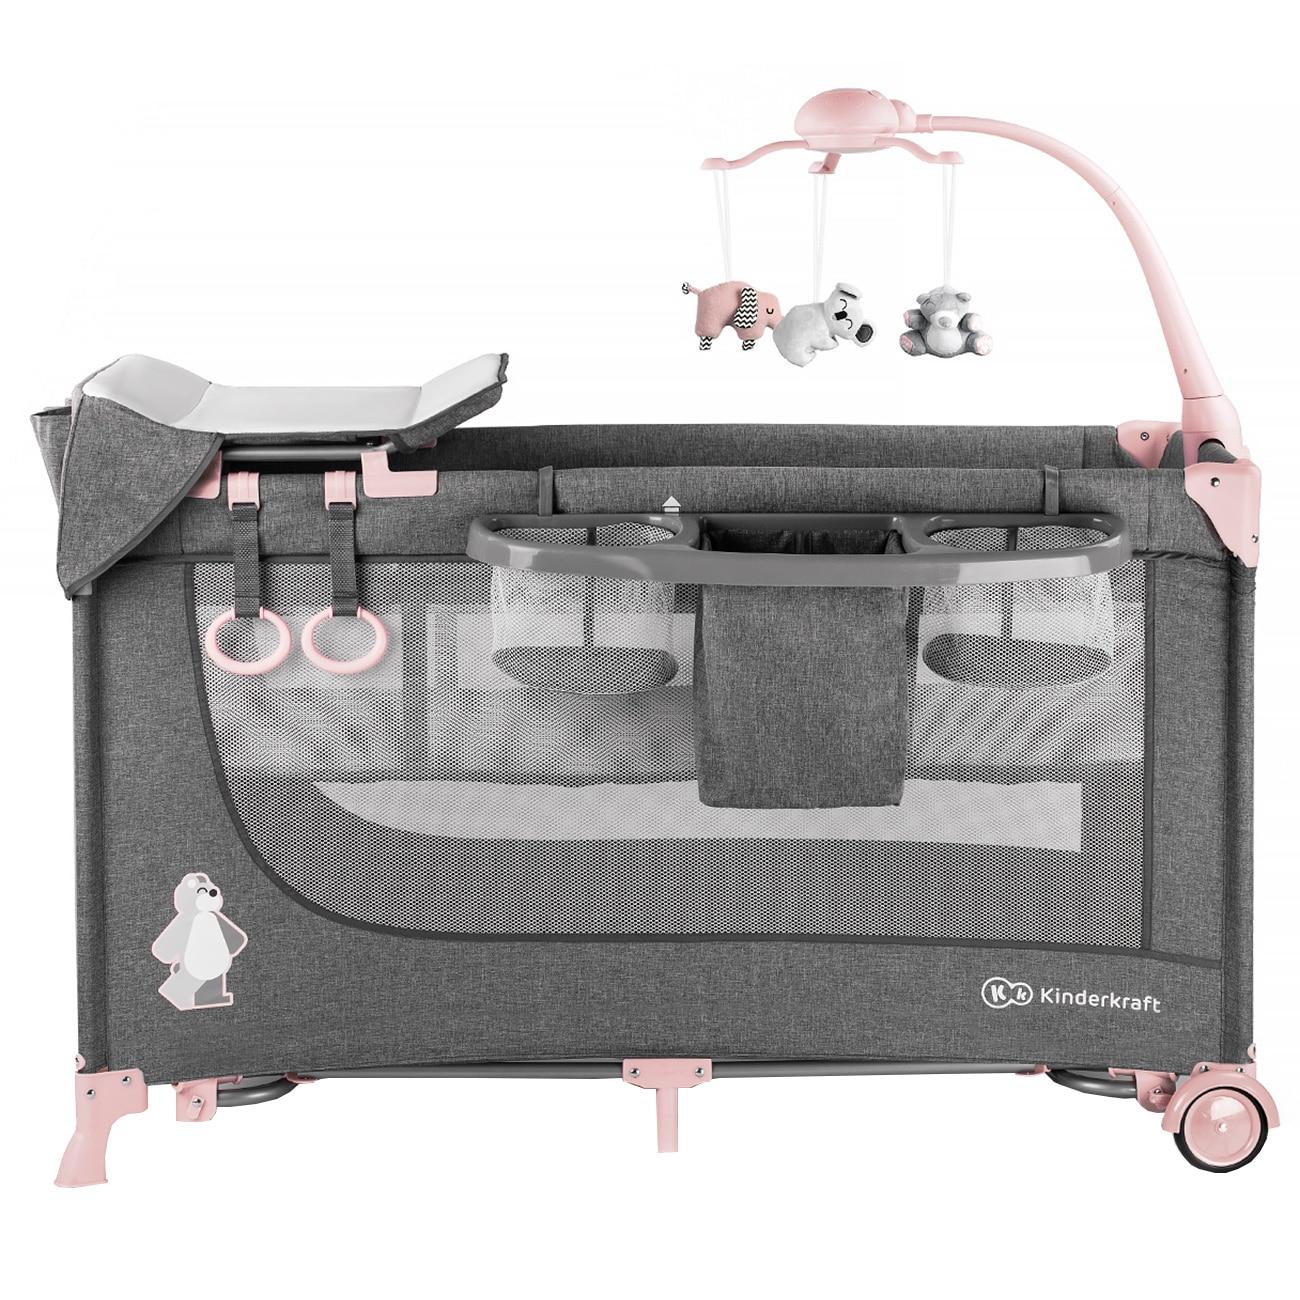 Fotografie Patut pliant Kinderkraft Joy, 2 nivele si accesorii, Gri/Roz